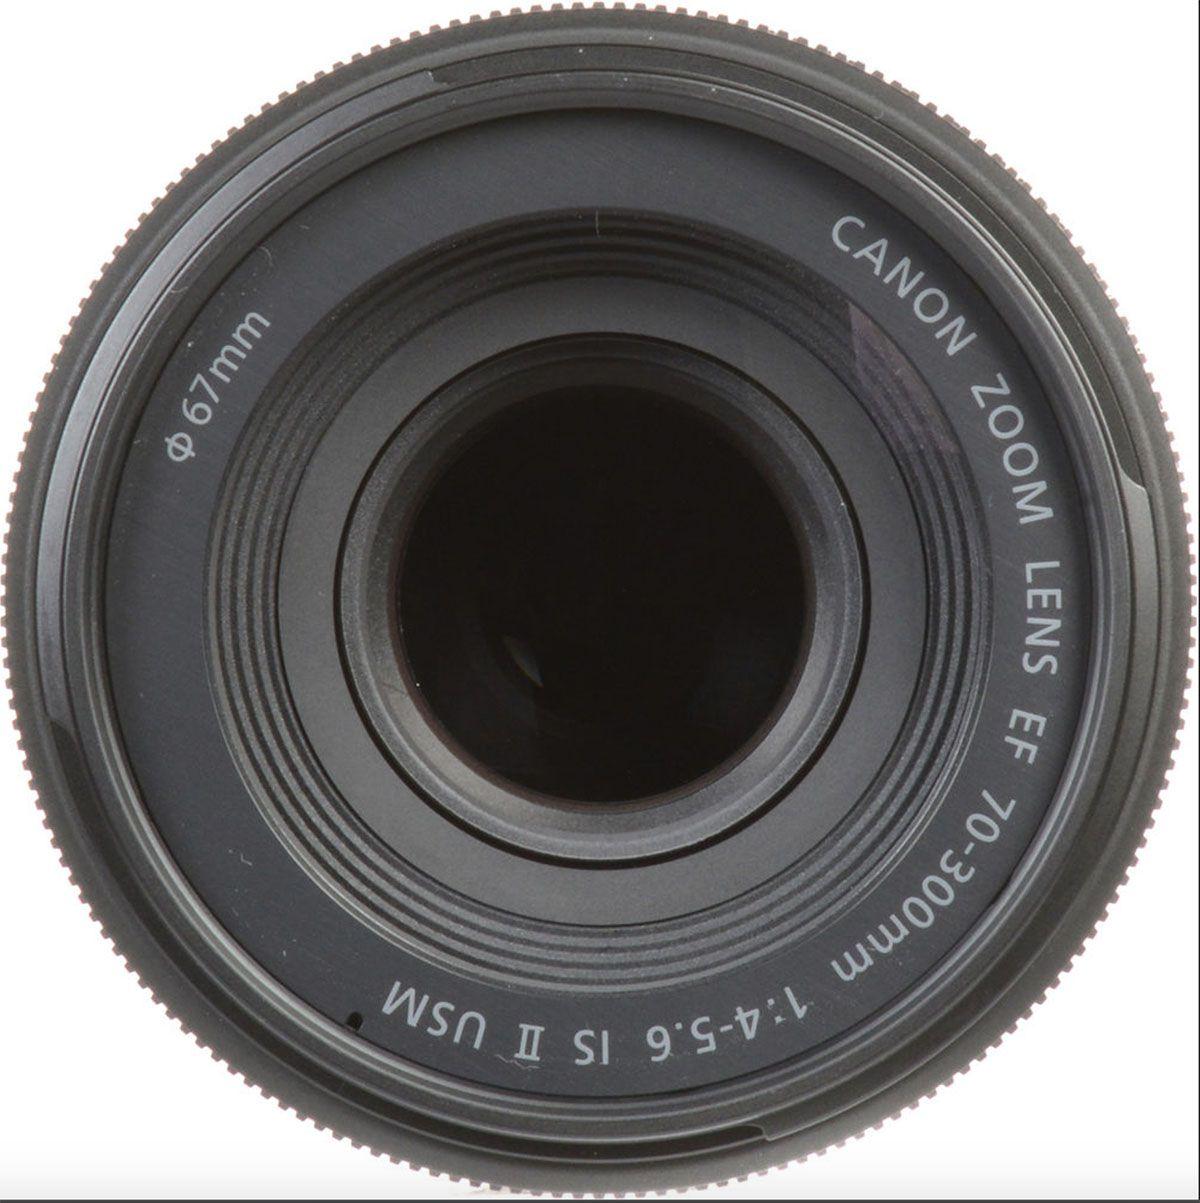 LENTE CANON EF 70-300MM F/4-5.6 IS II USM